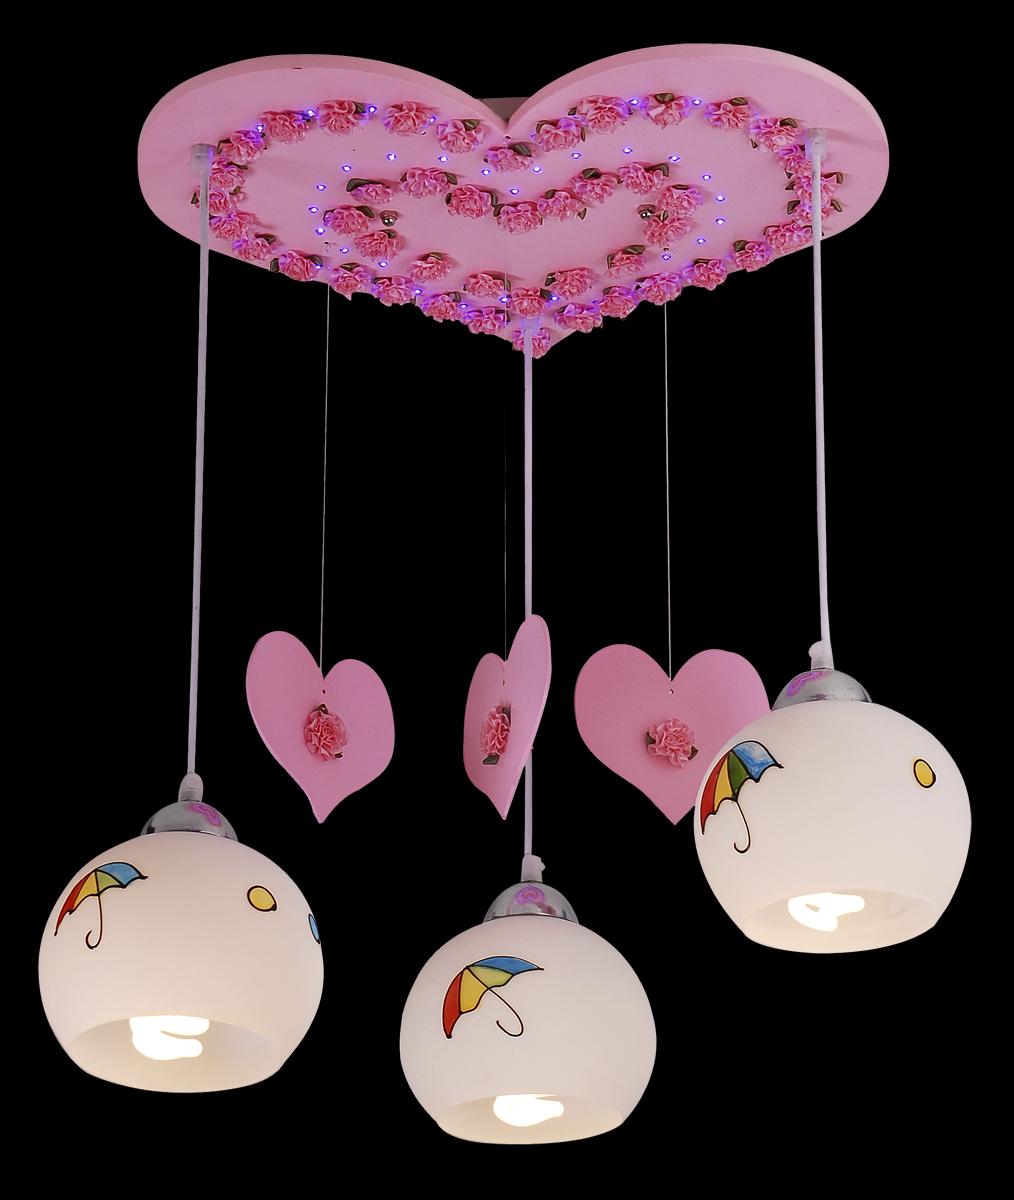 Светильник Natali Kovaltseva HEART 10571/3C (1180)HEART 10571/3C (1180)W45 x L43 x H60 cm